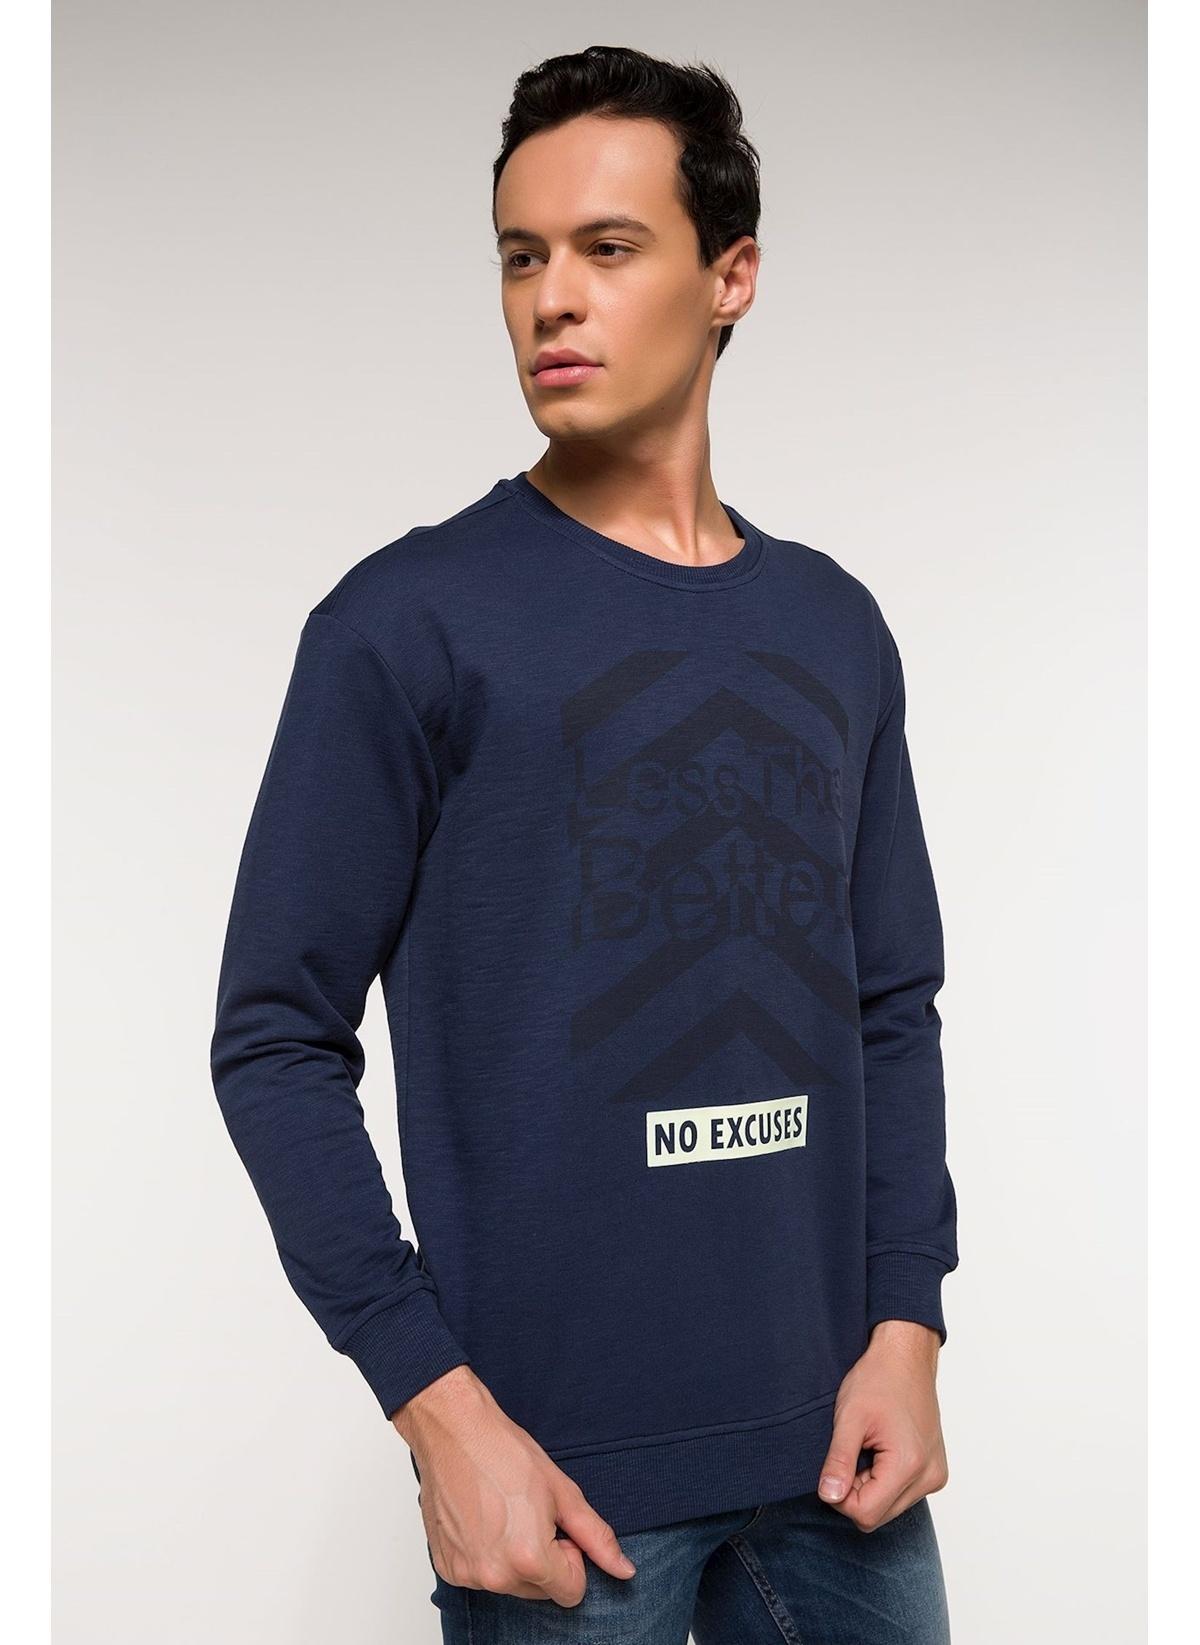 Defacto Sıfır Yaka Baskılı Sweatshirt I3576az18spın75 Sweatshirt – 29.99 TL